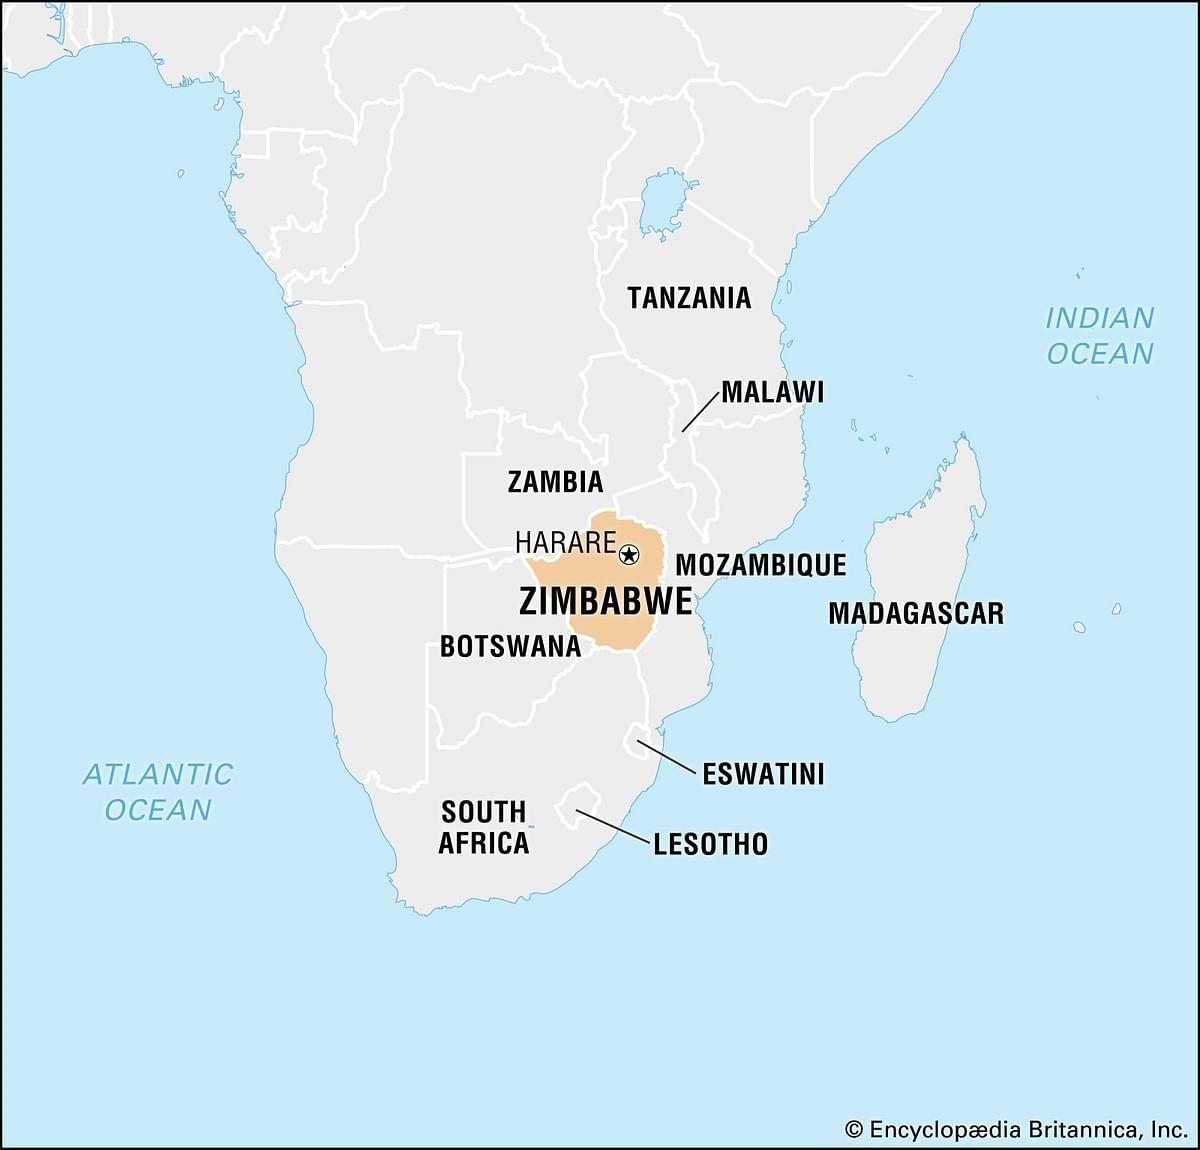 Tsingshan to Break Ground for Iron Mine & Steel Plant in Zimbabwe